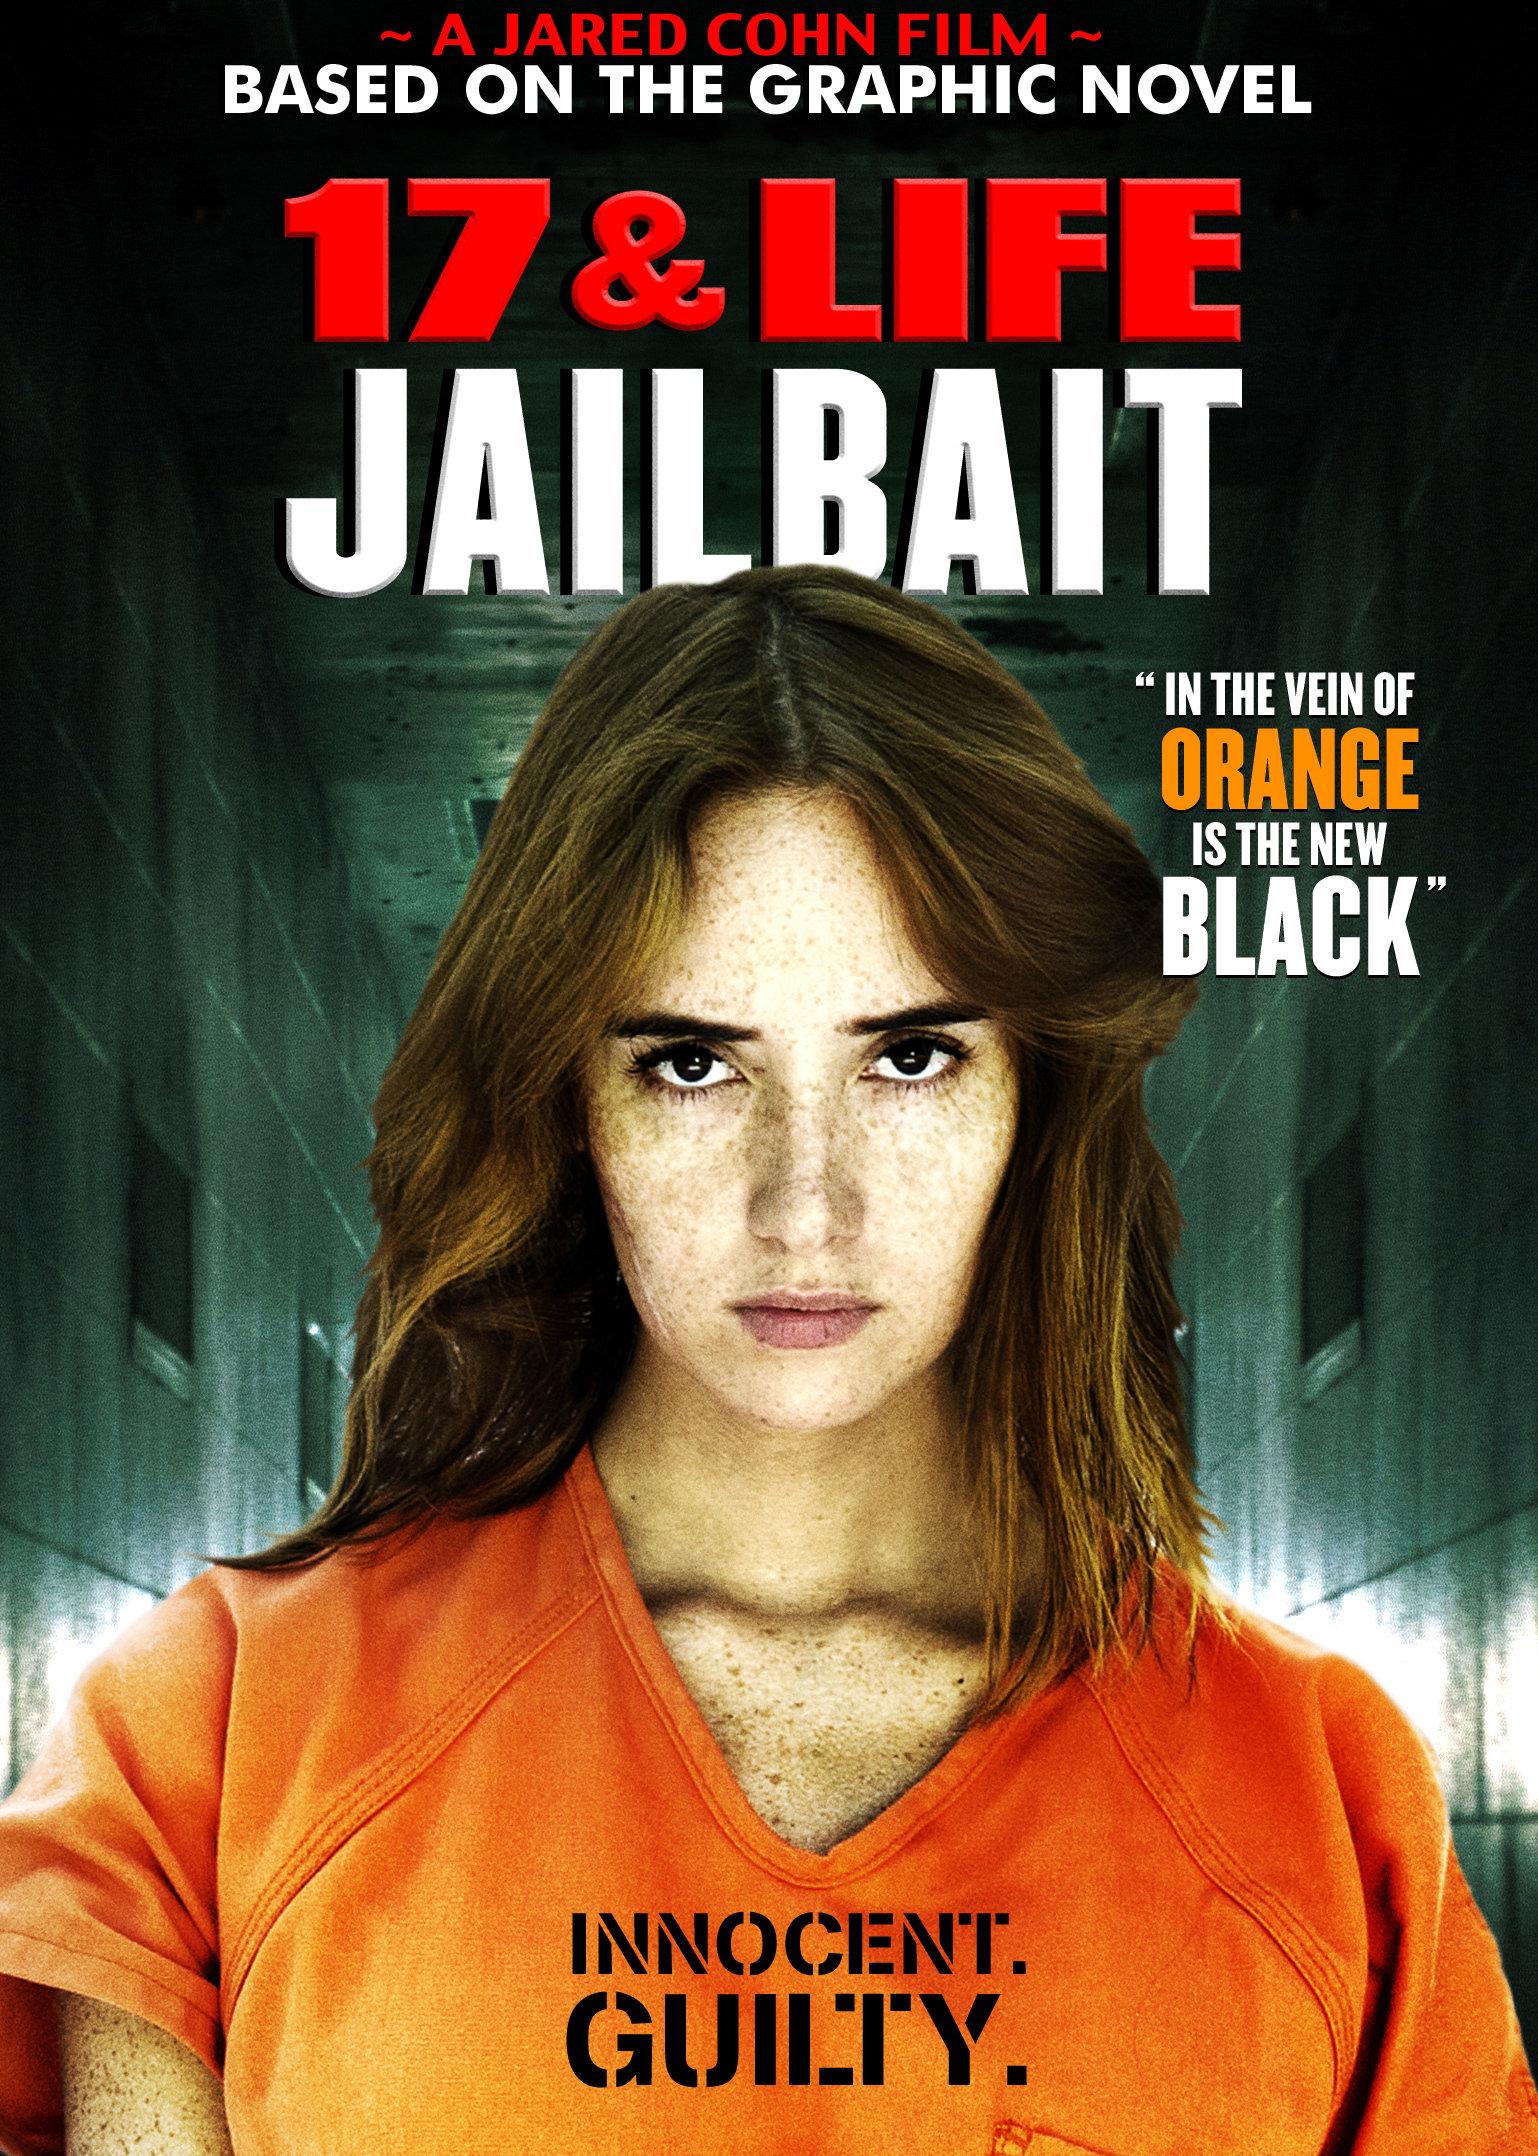 Jailbait girl boy photo sexy girls